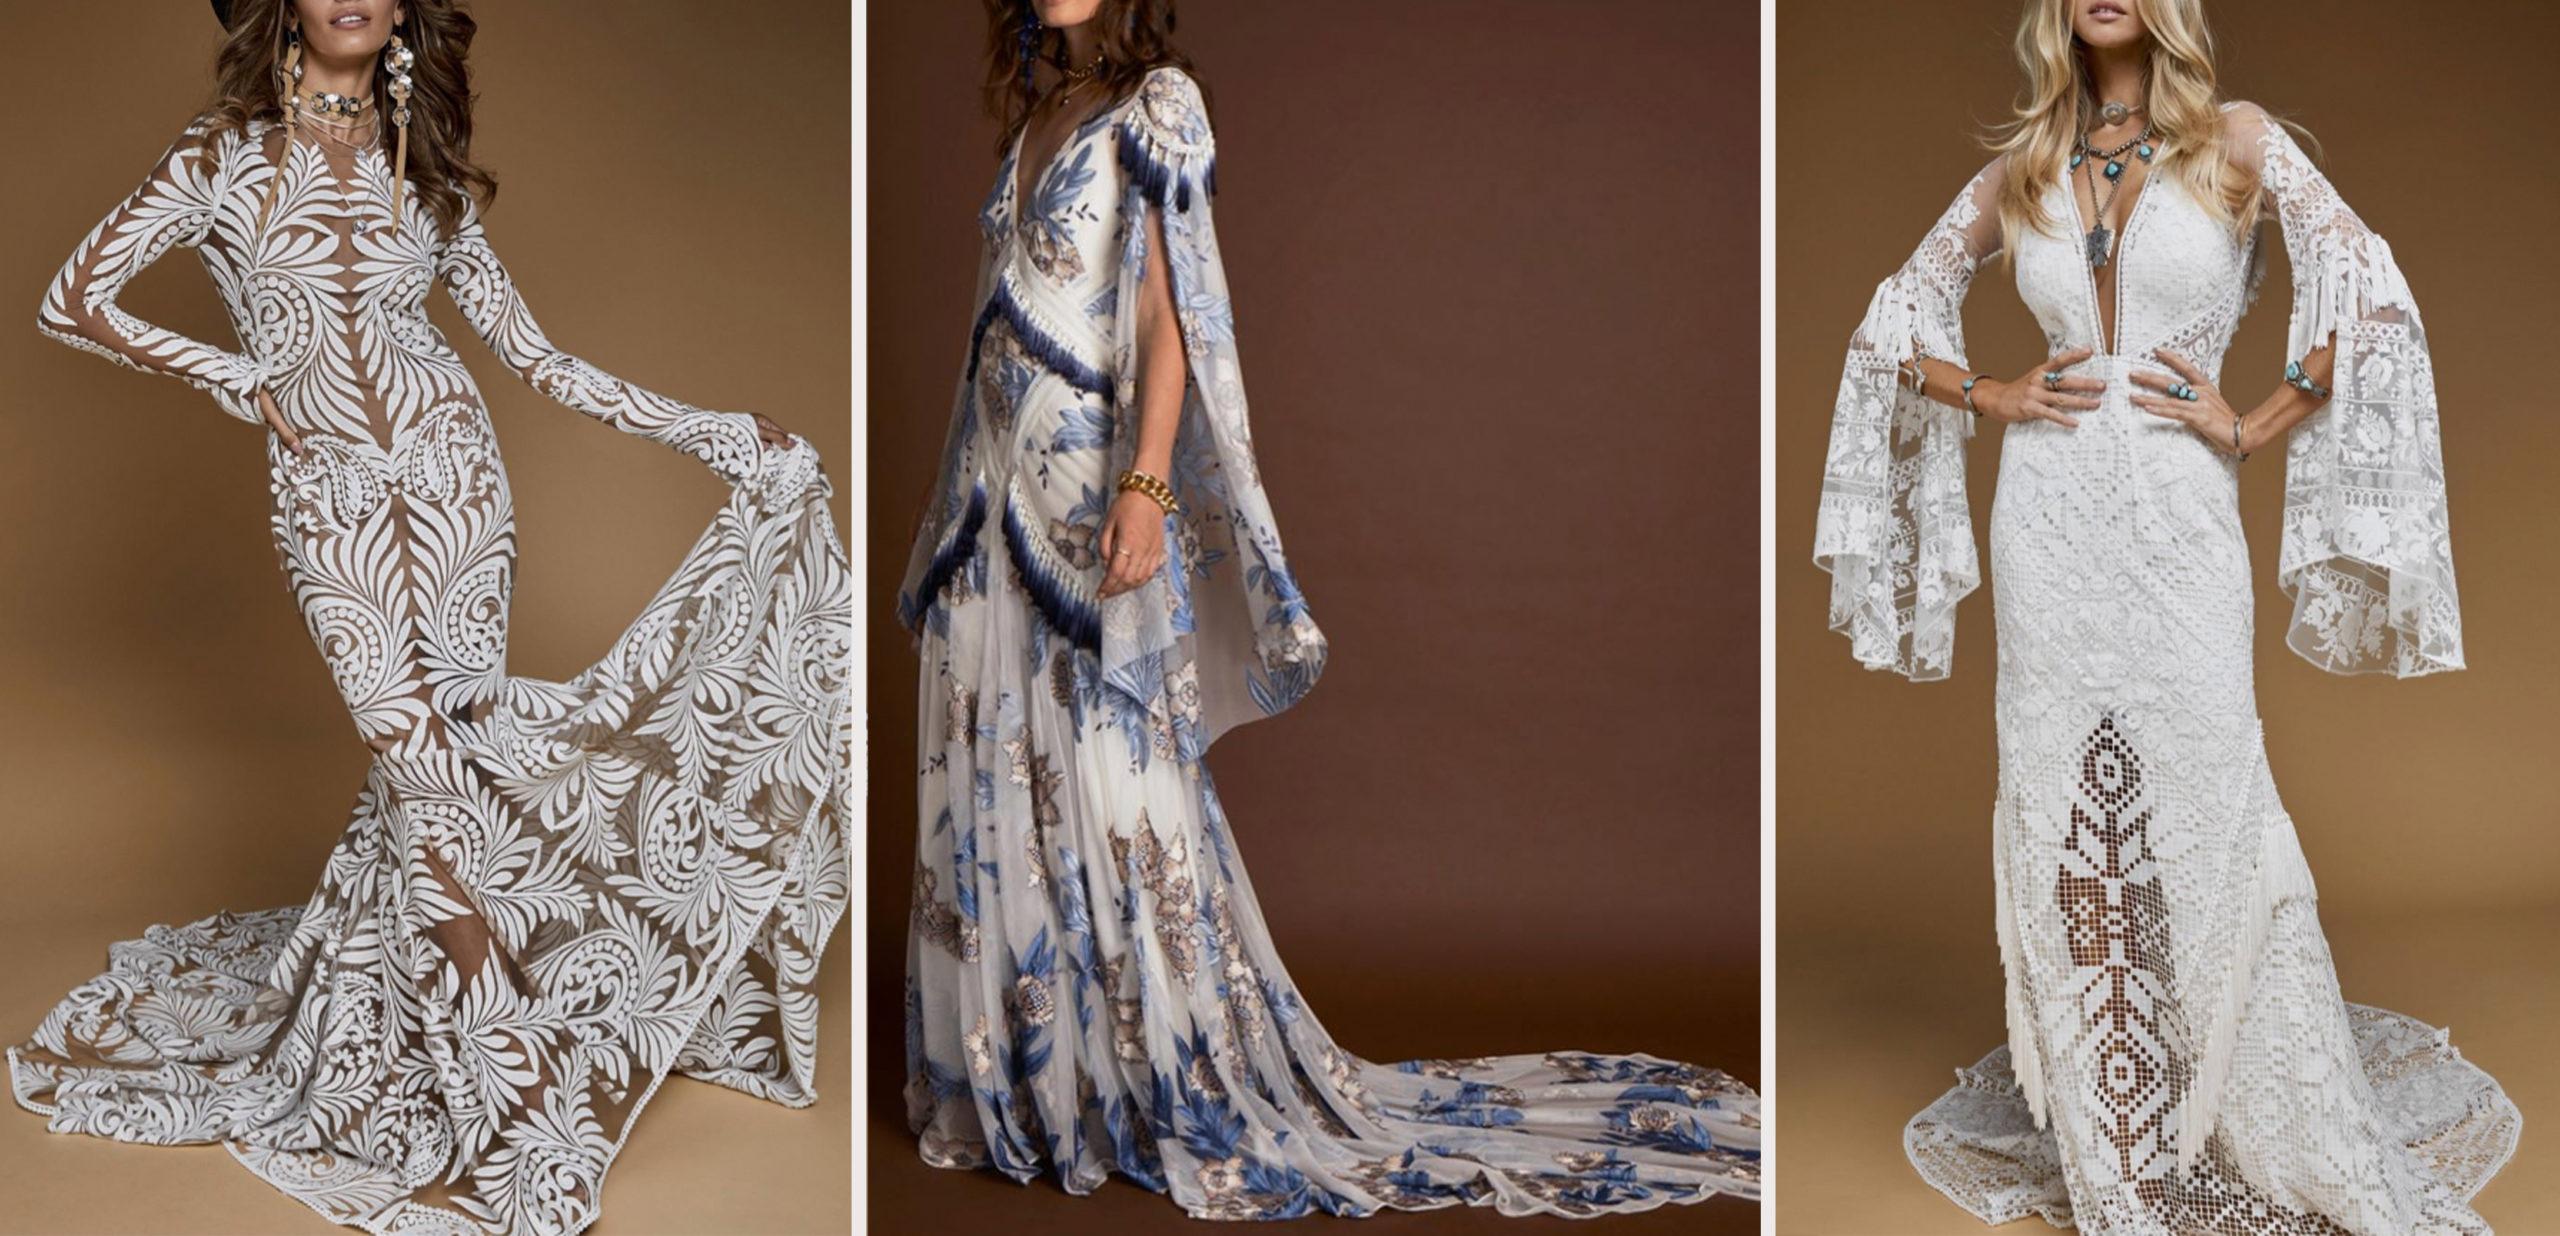 Rue De Seine Gowns from Lovely Bride